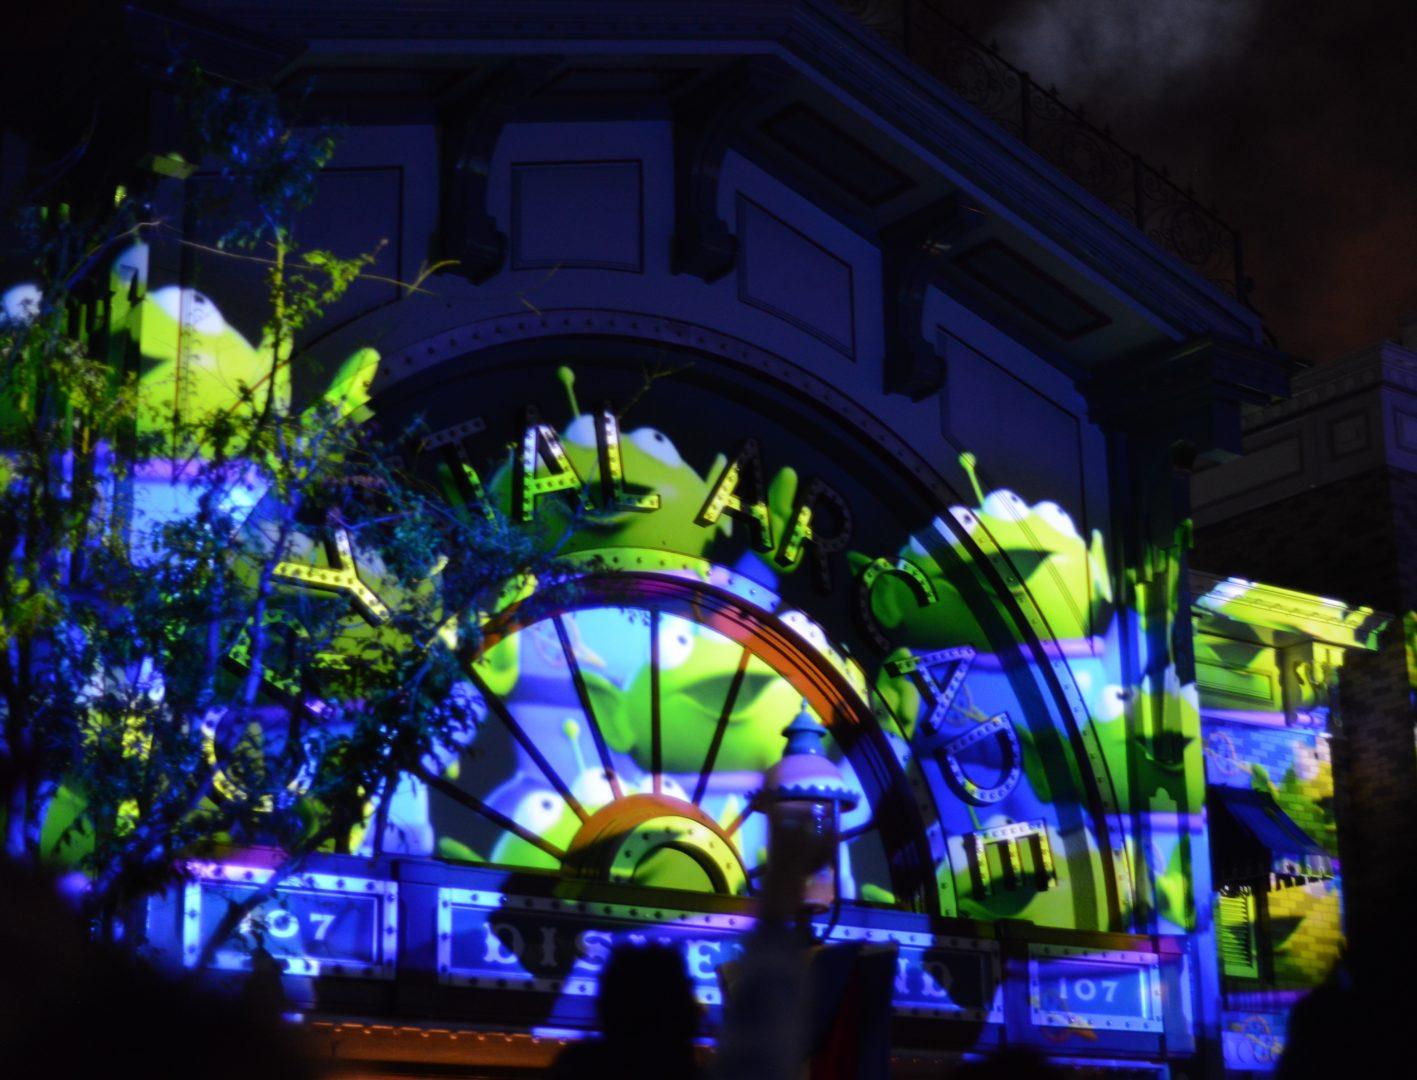 Green Aliens Projected on Main Street for Together Forever Fireworks at Pixar Fest in Disneyland